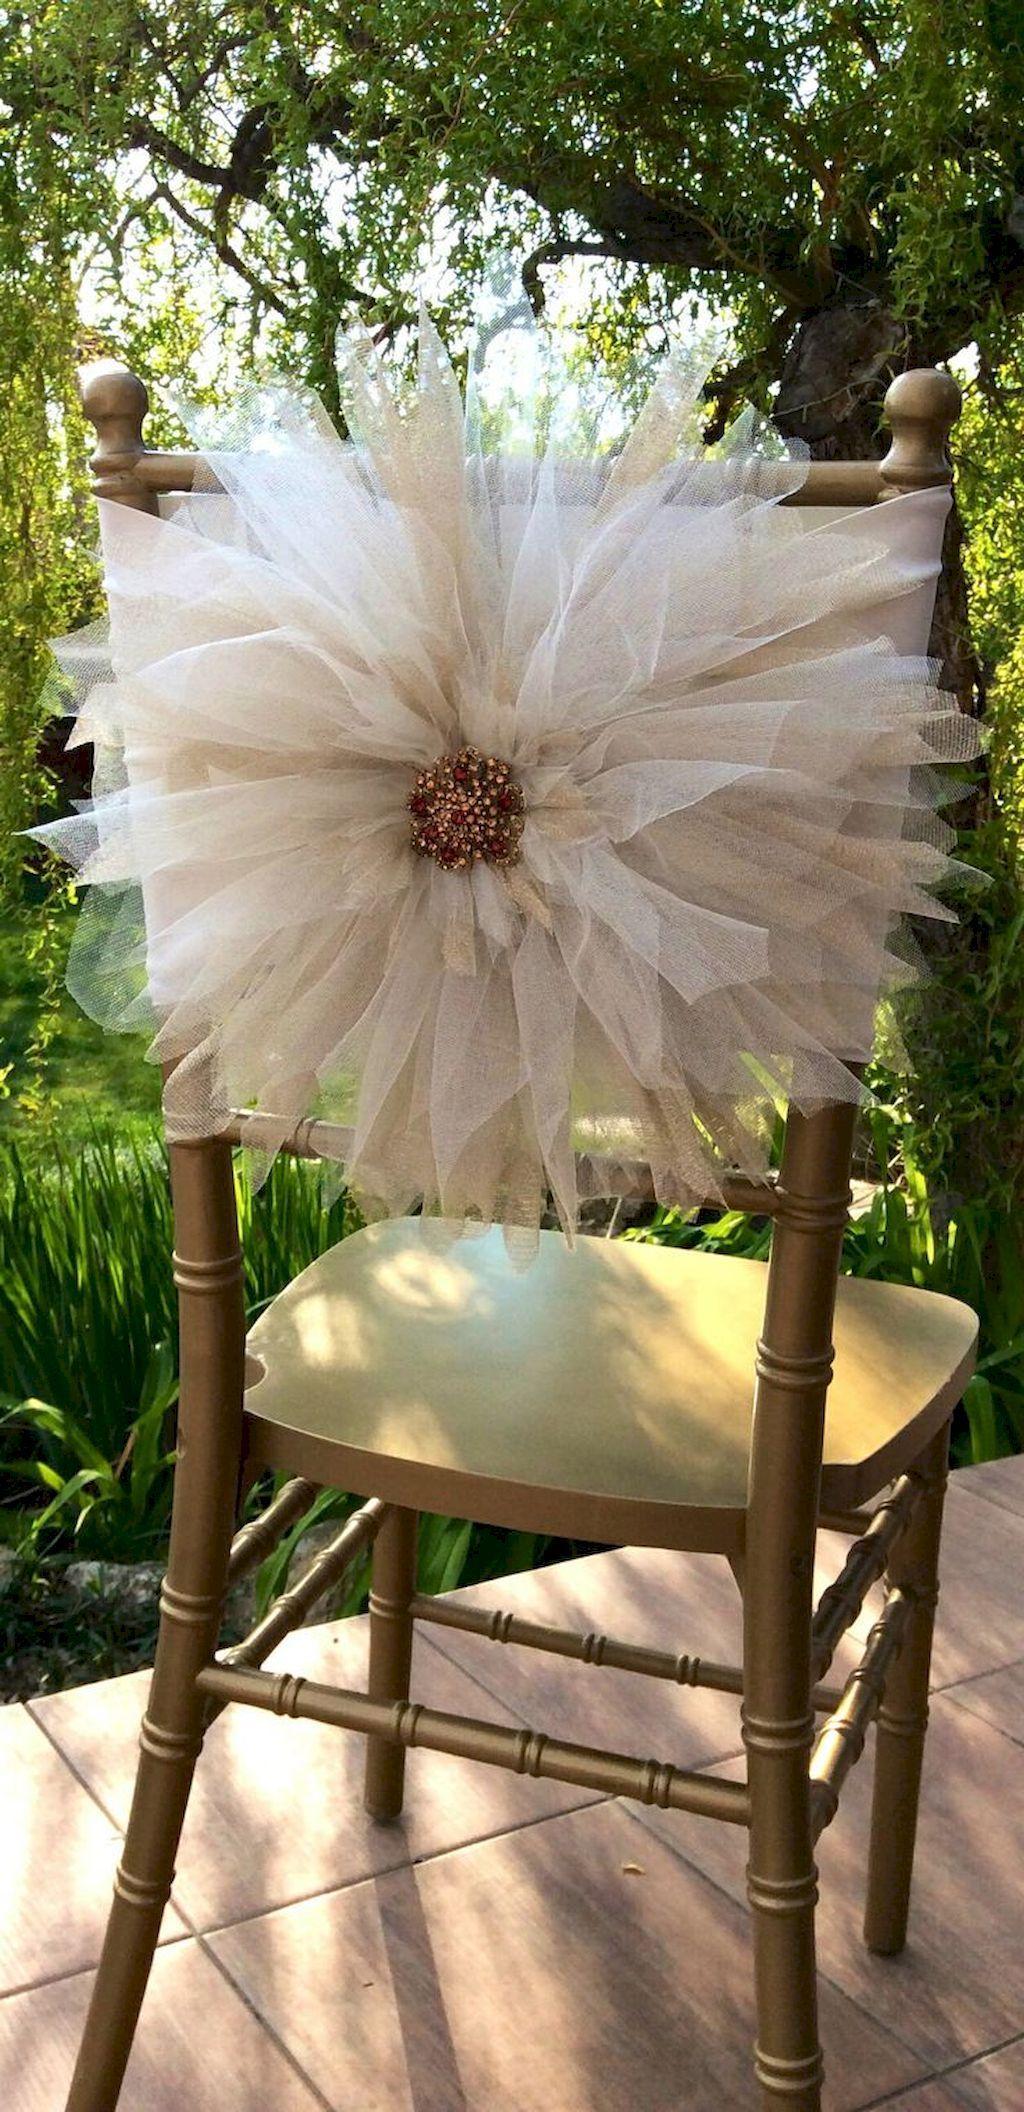 Wedding chair decorations diy  Pin by Vicki CoxThomas on Wedding  Pinterest  Wedding chairs